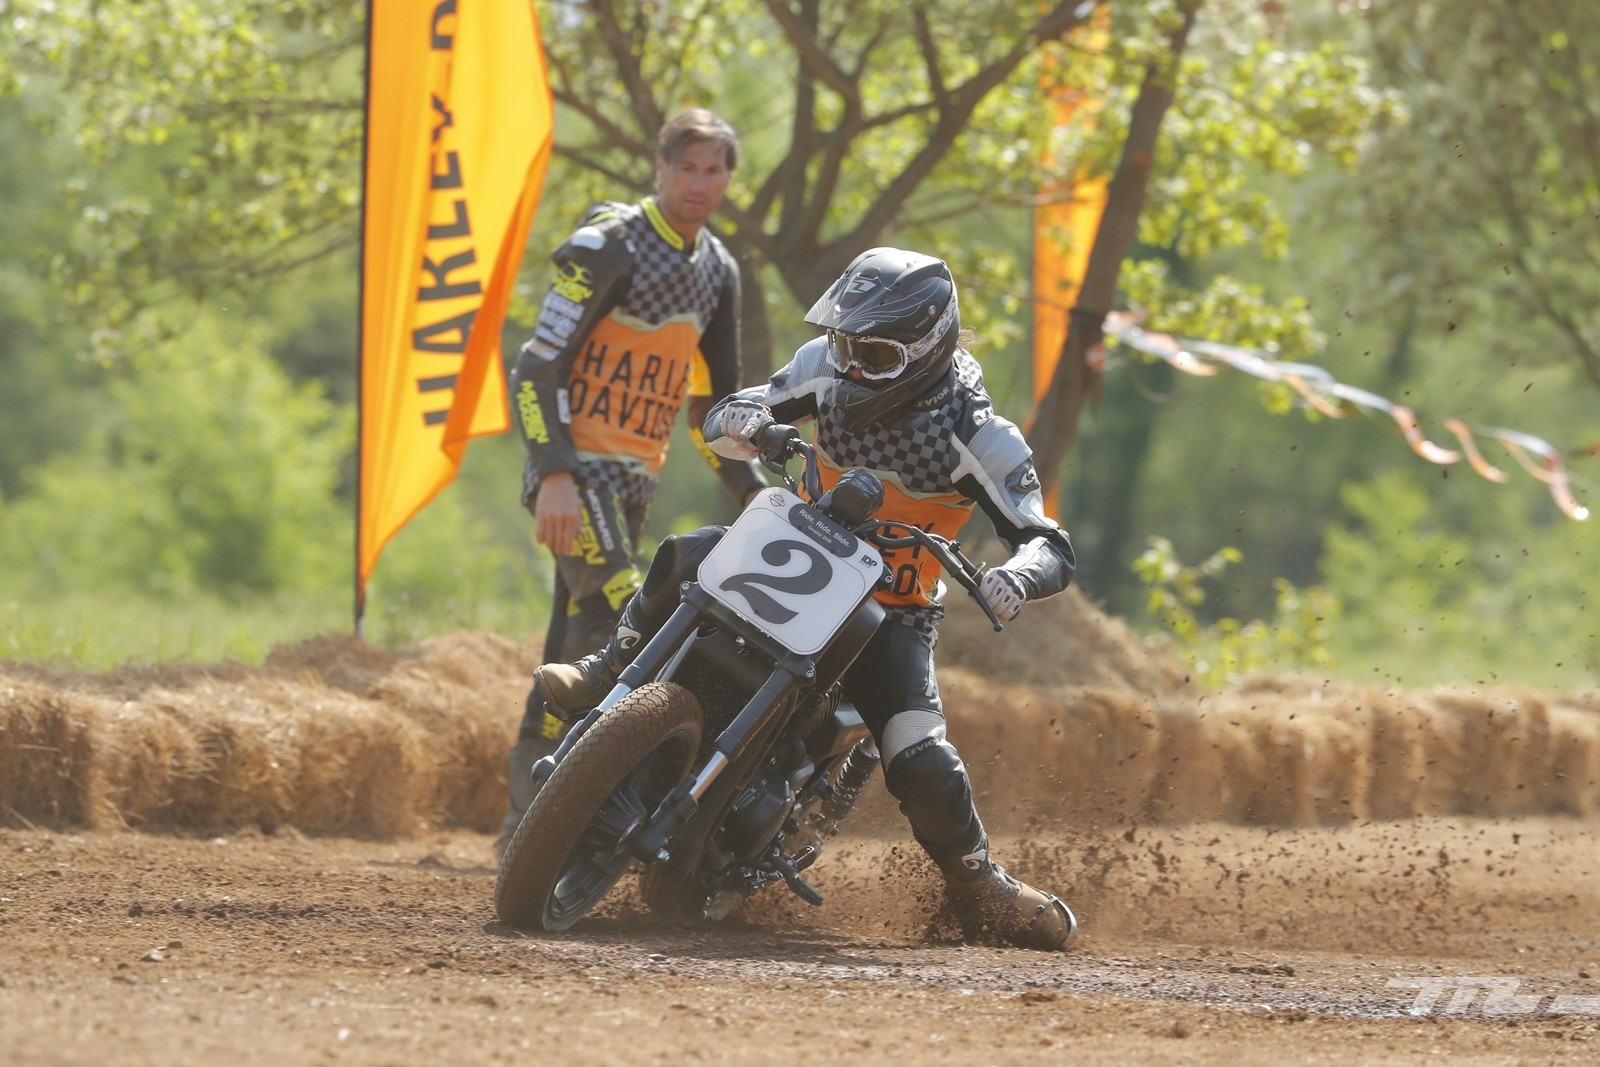 Foto de Harley-Davidson Ride Ride Slide 2018 (31/82)